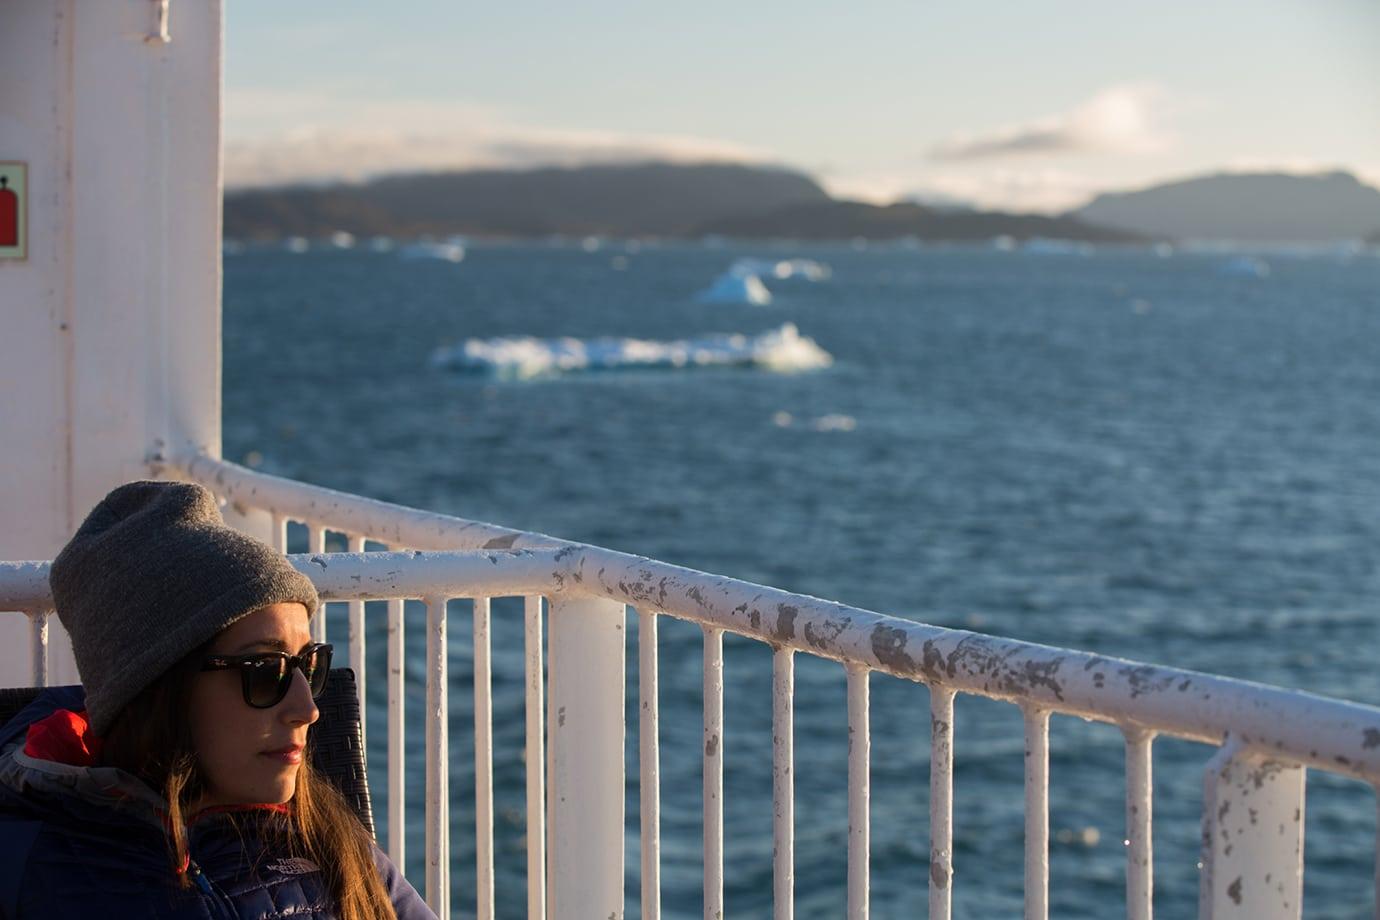 Boat ride on the Sarfaq Ittuk